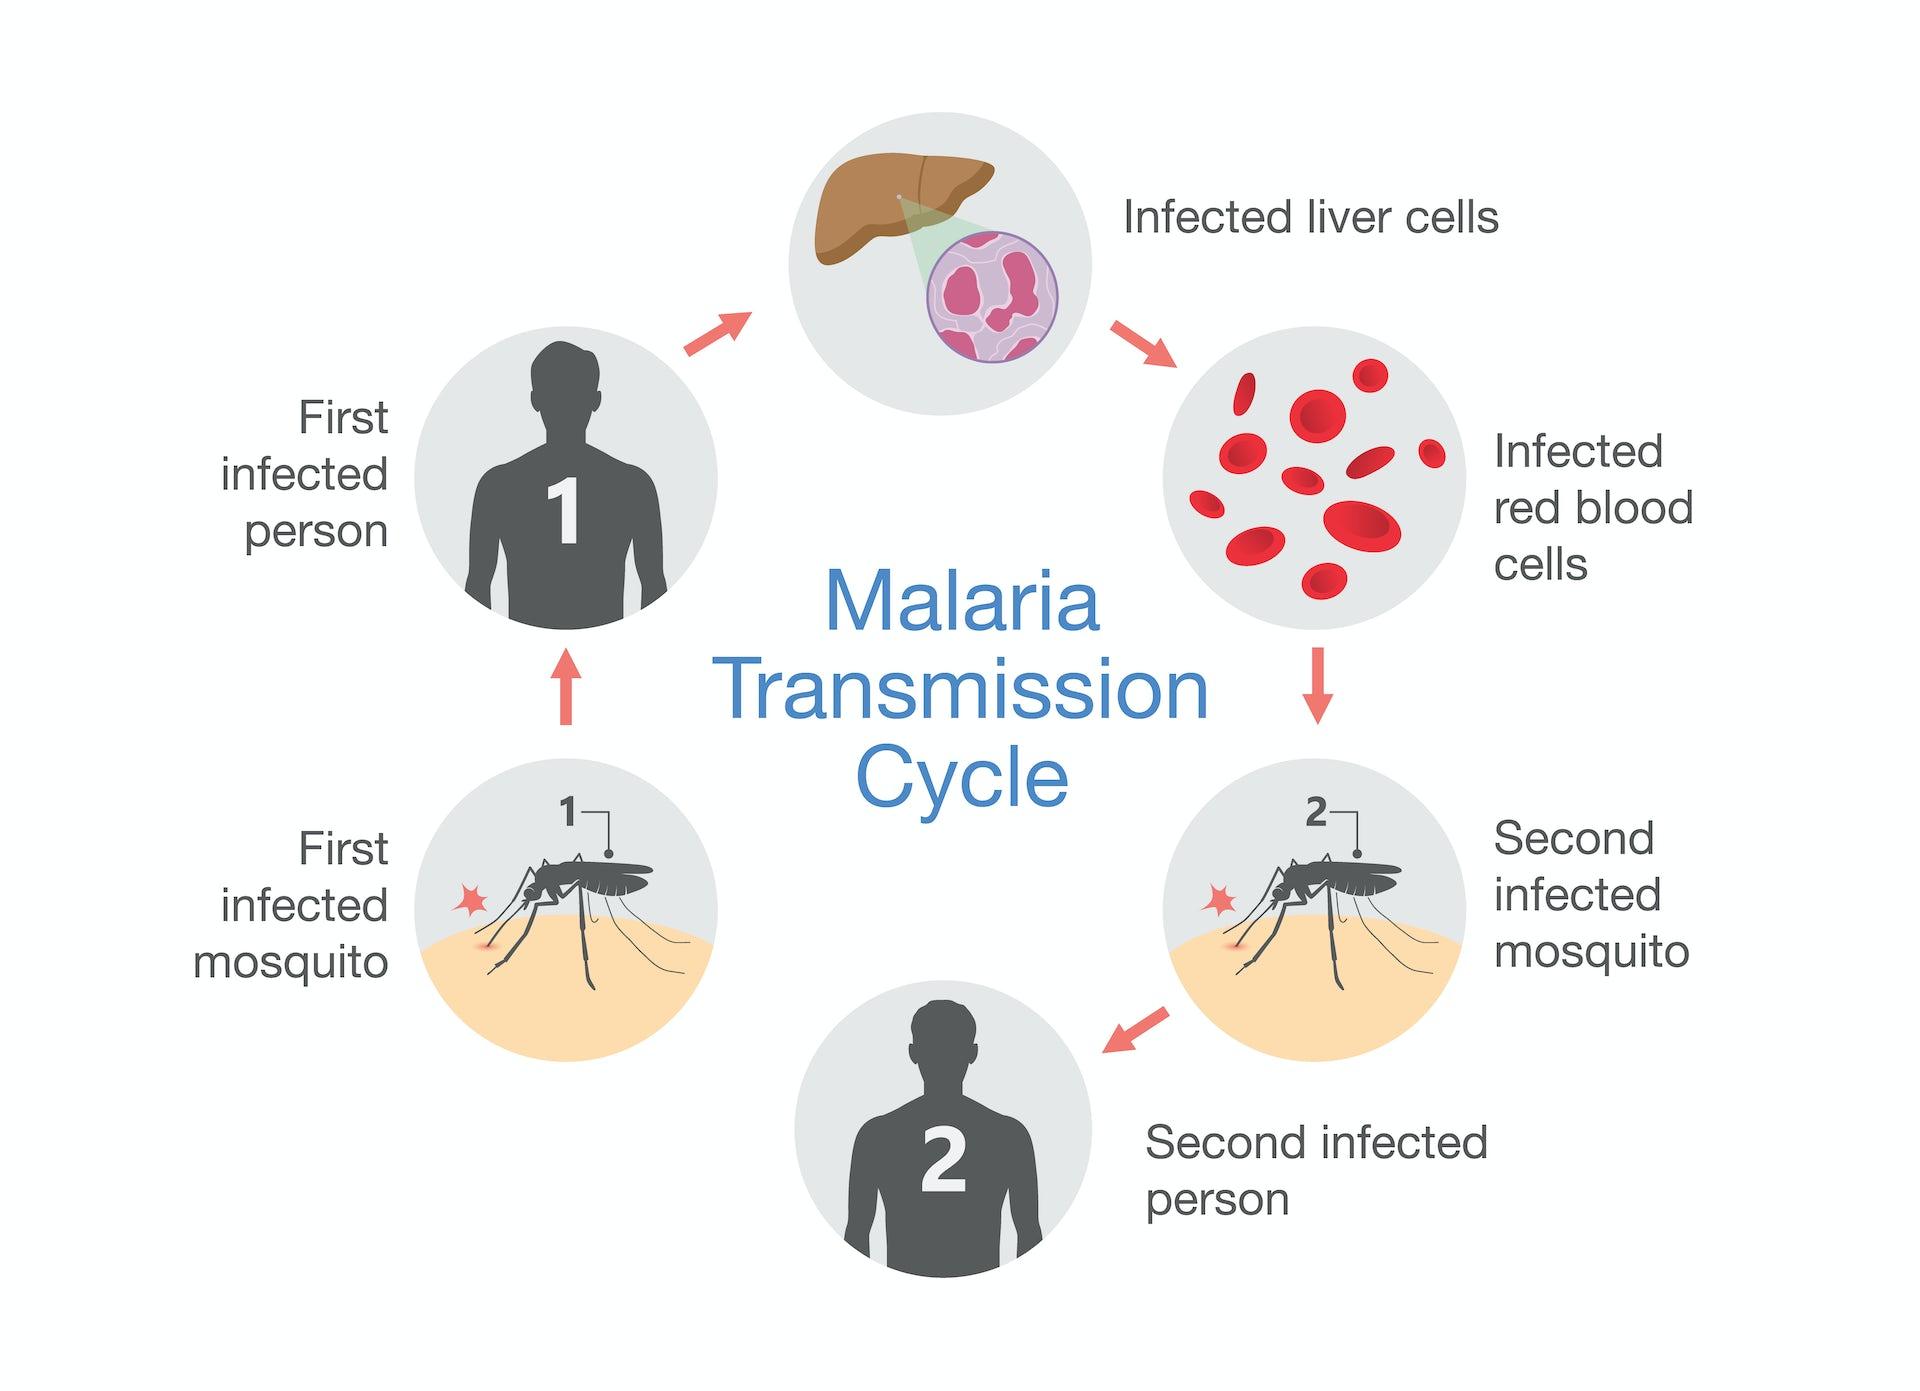 new diagnostic test for malaria uses spit, not blood dengue vs malaria malaria symptom diagram #14